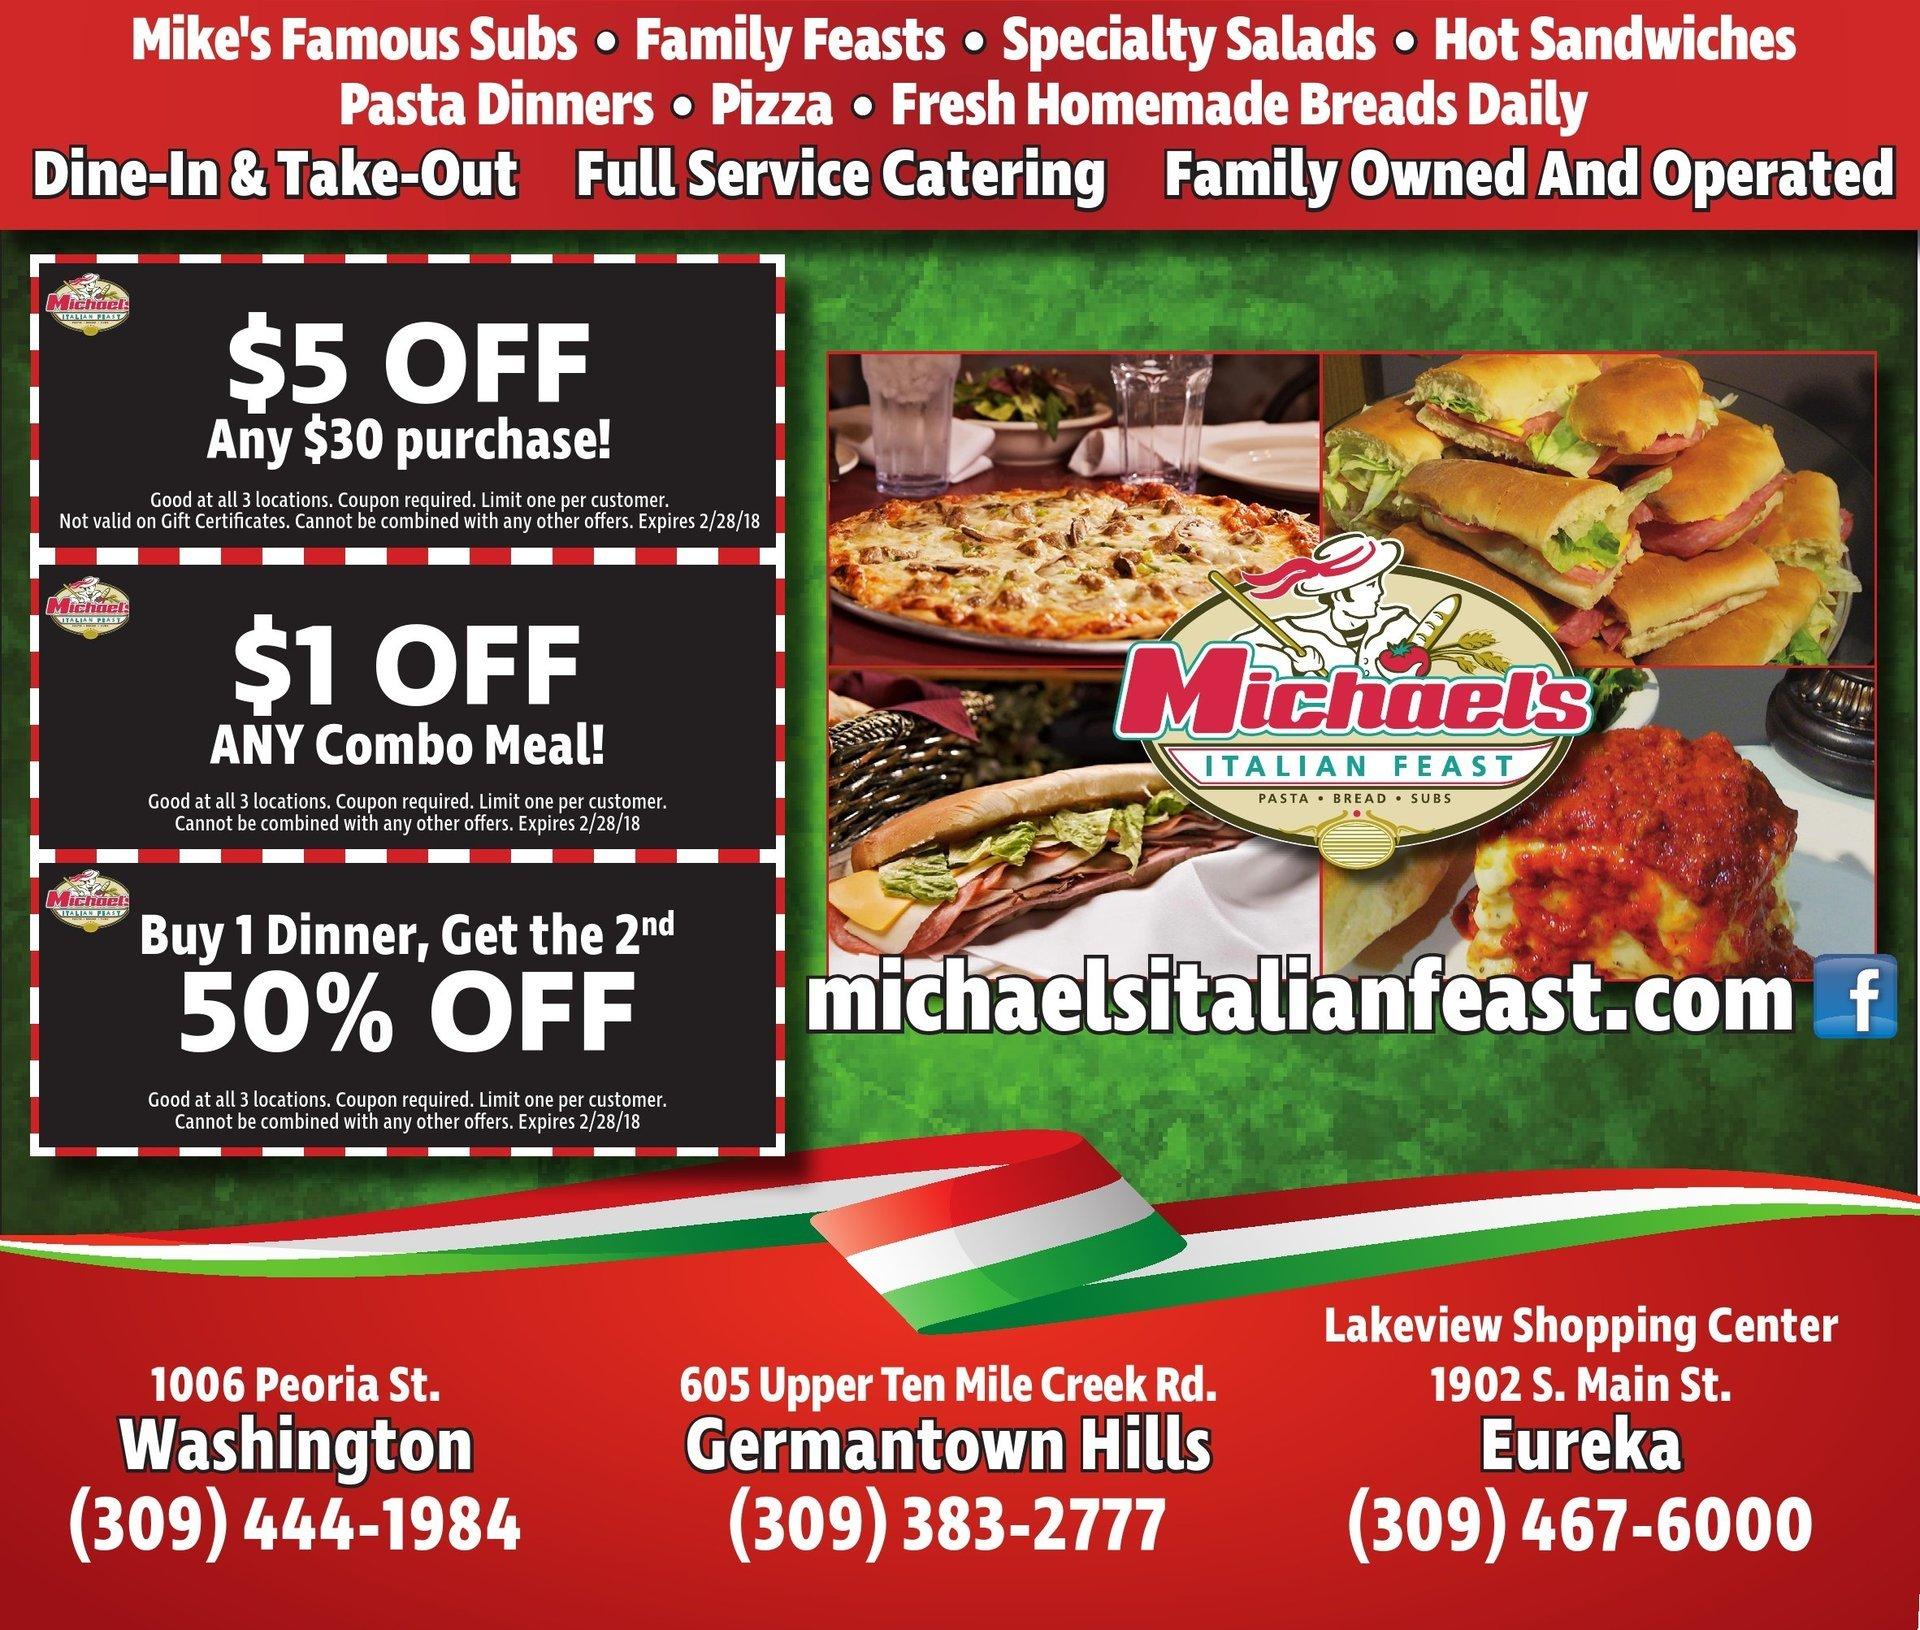 Michael's Italian Feast coupons BOGO $5 off $1 off Washington, Germantown Hill, Metamora, IL